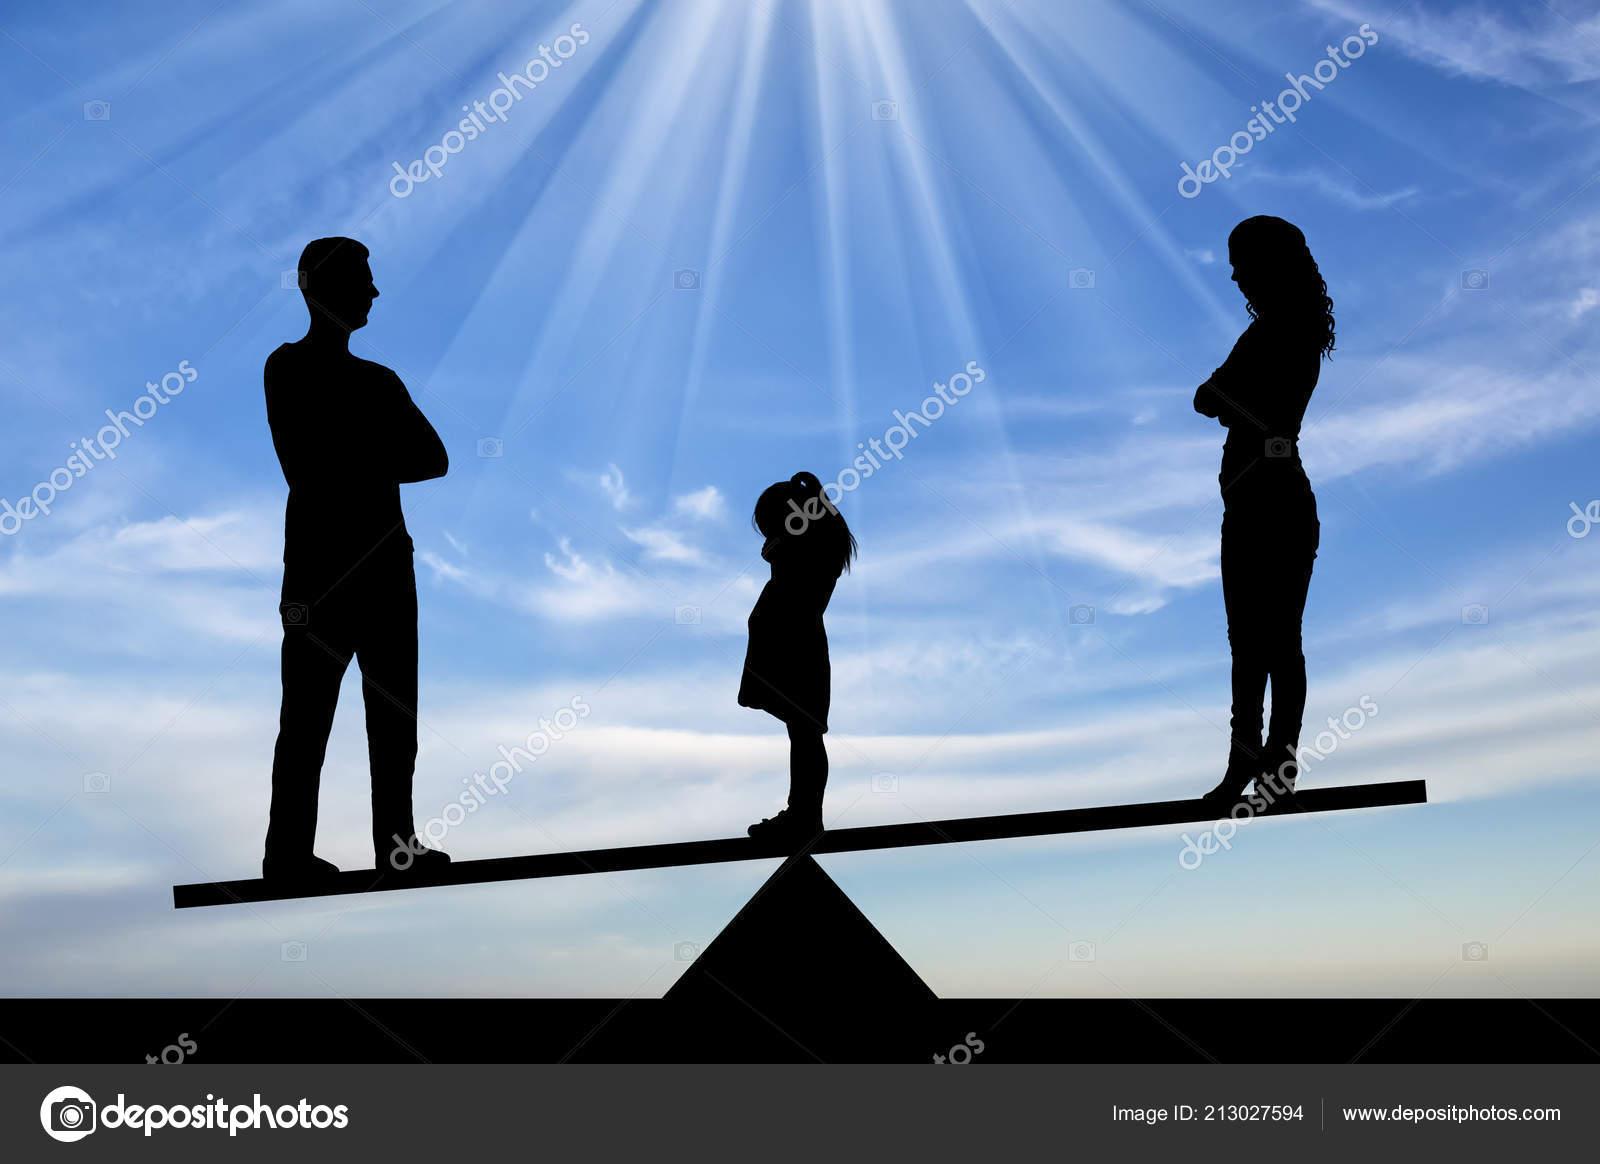 Images Divorce Sad Divorce Family Silhouette Little Sad Girl Crying Standing Mom Dad Stock Photo C Prazisss 213027594